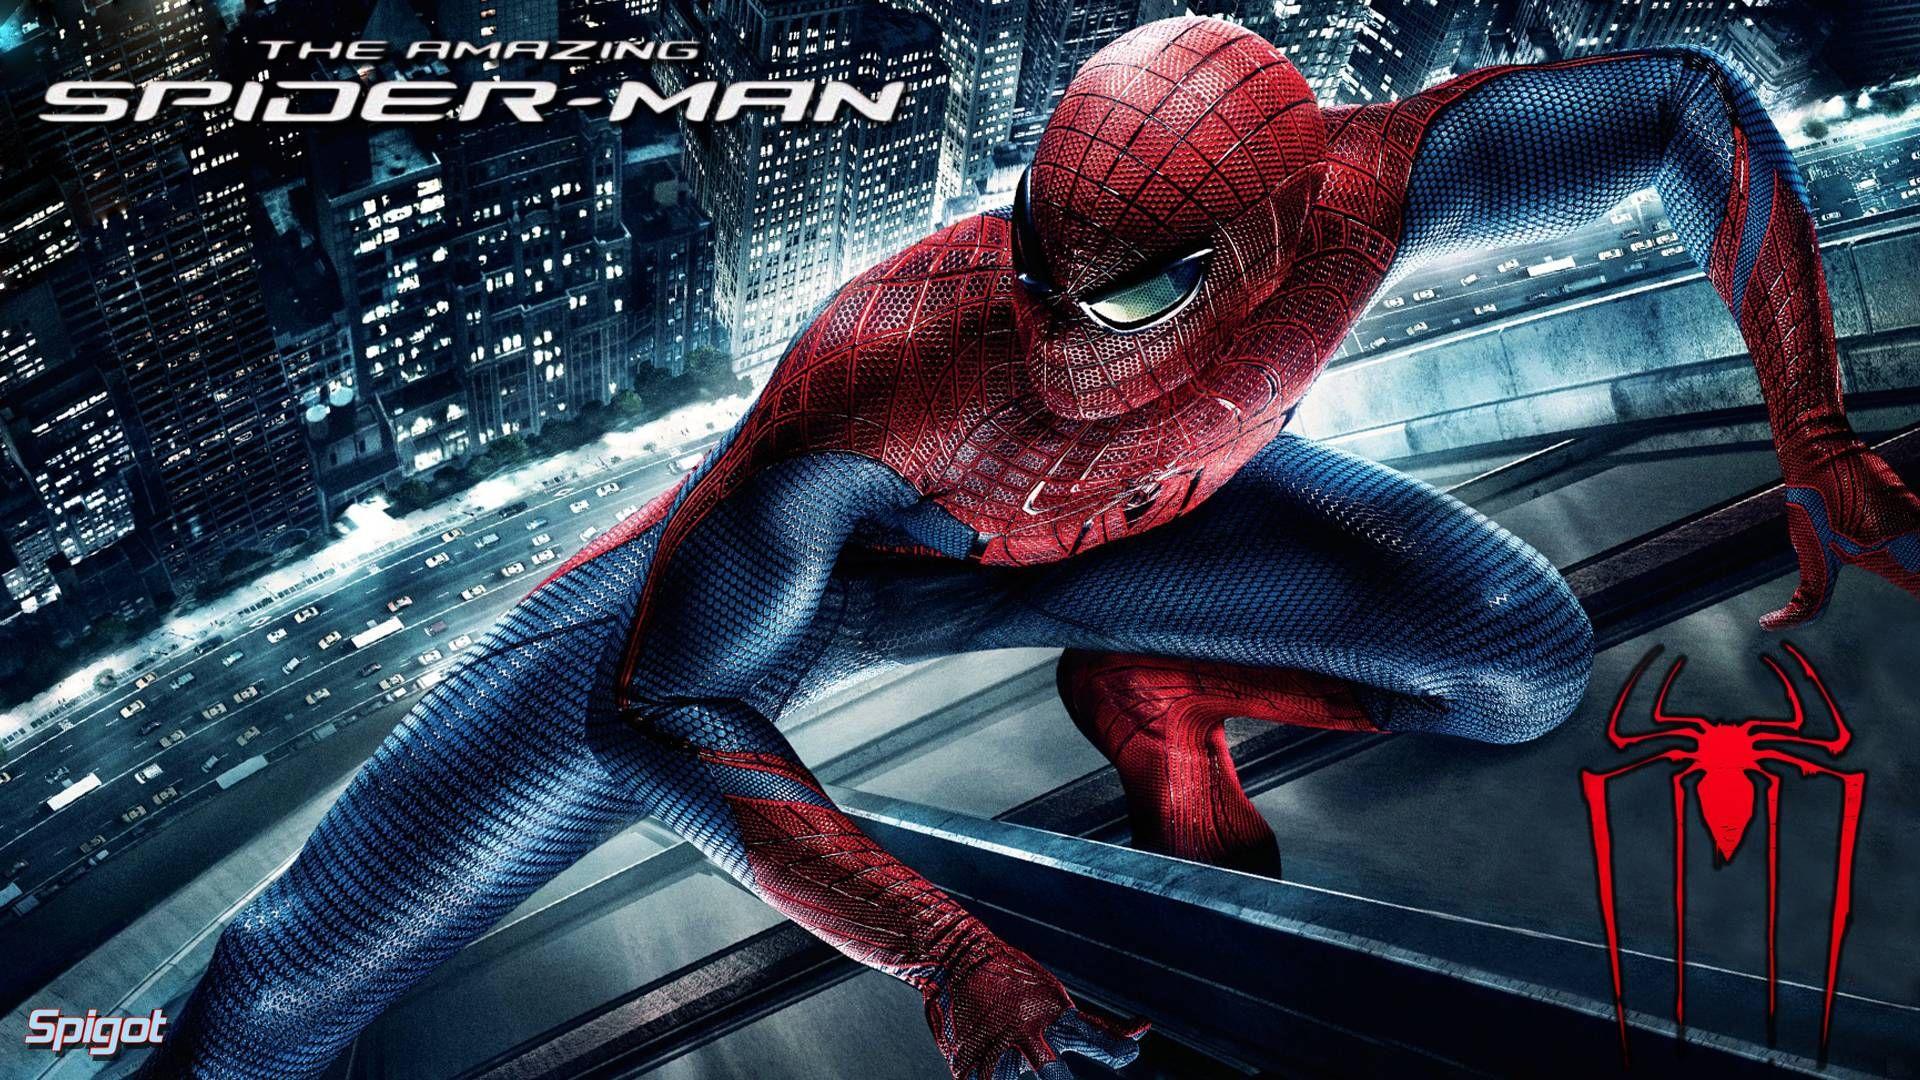 Wallpapers Hd Spiderman Hd Wallpapers Of Spiderman  Wallpapers